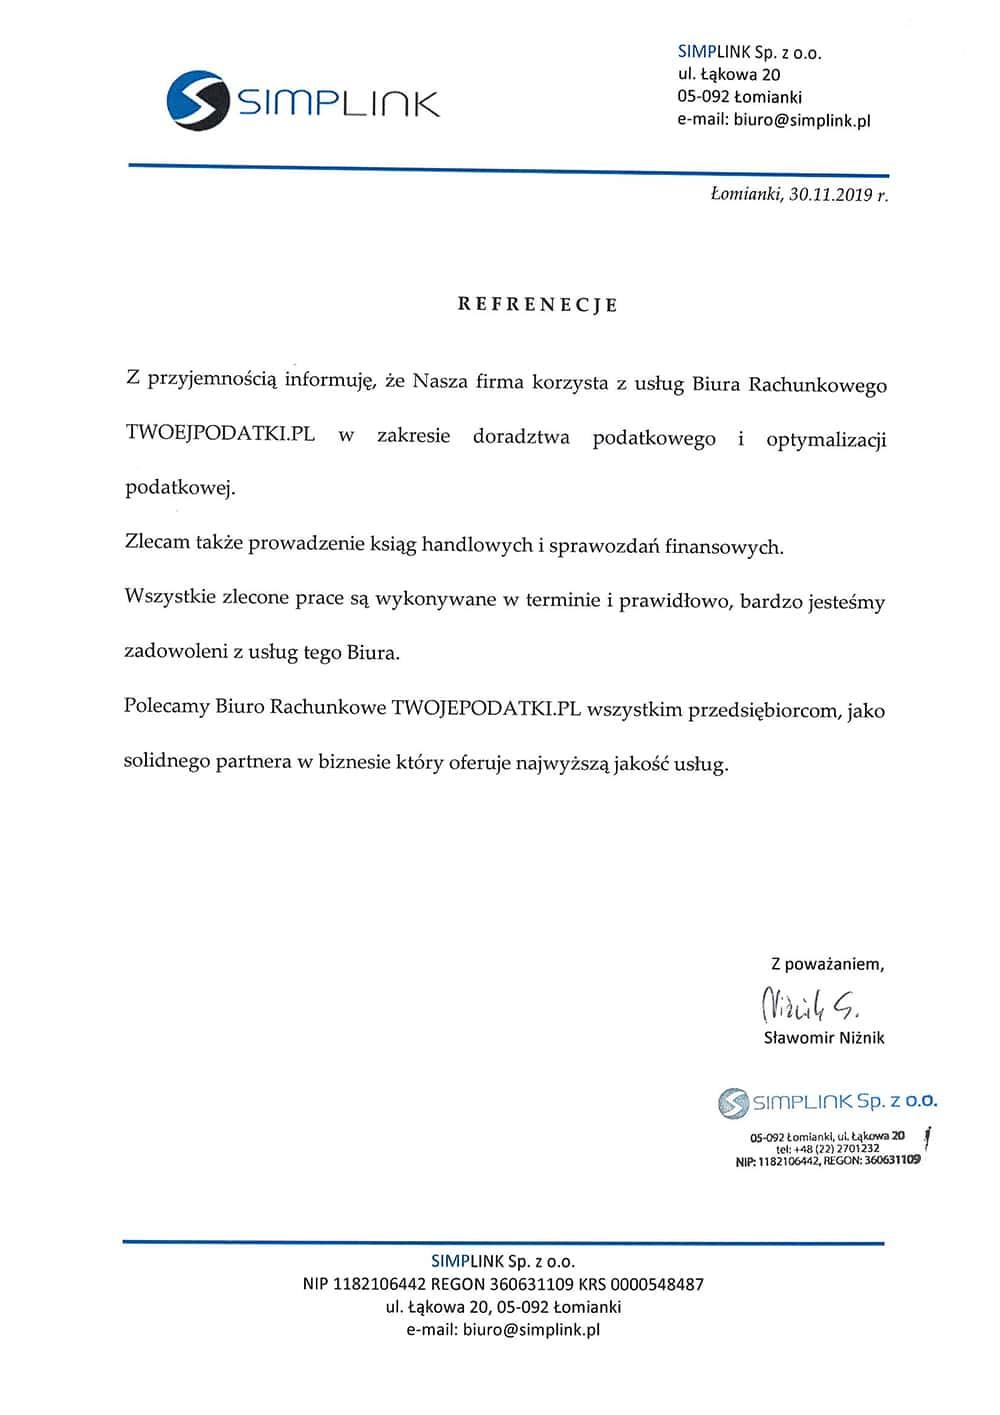 Xerox Scan_19012020204625